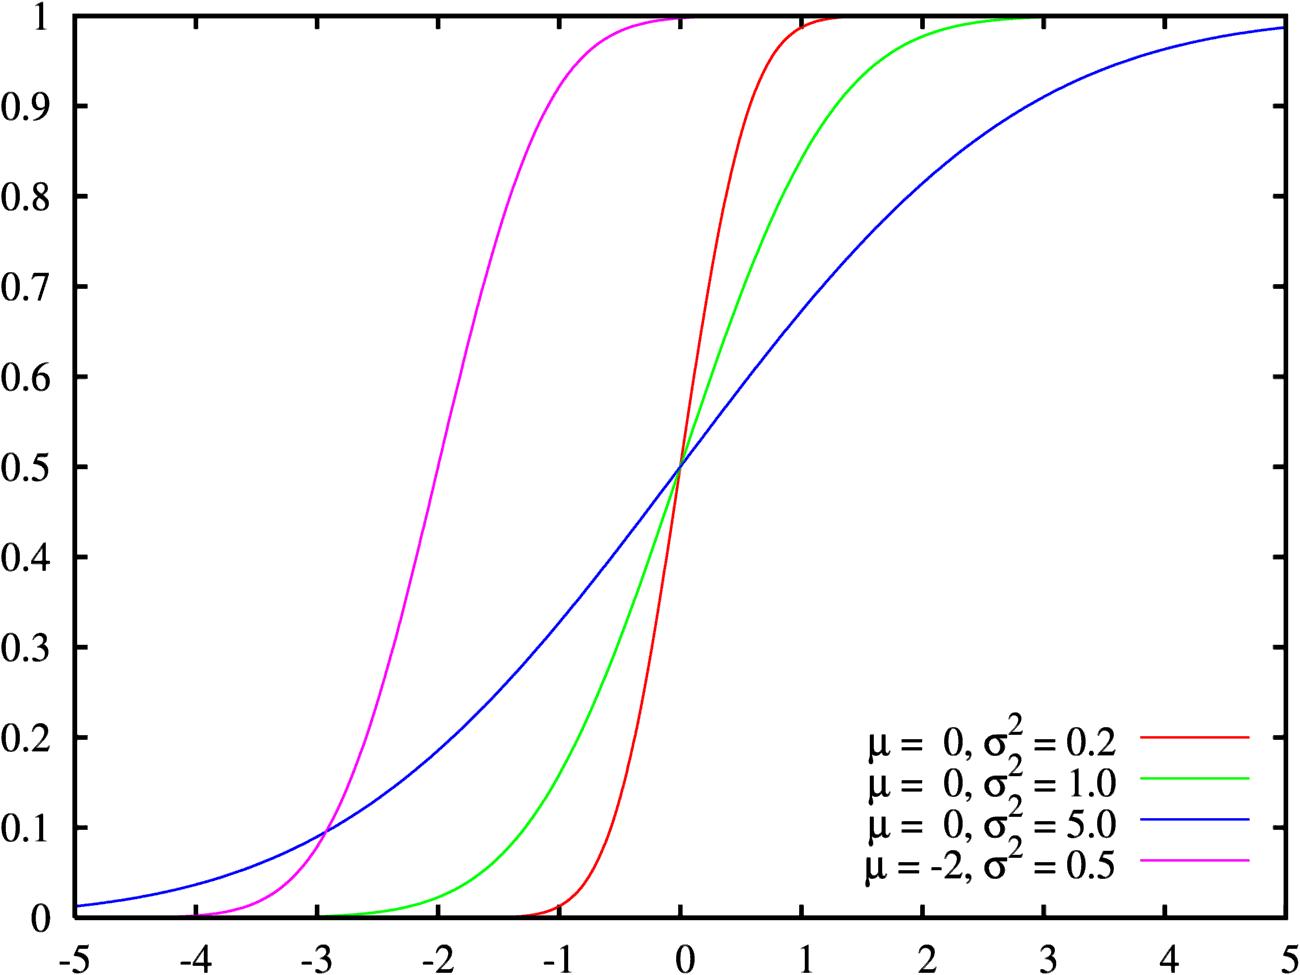 uniform distribution pdf and cdf